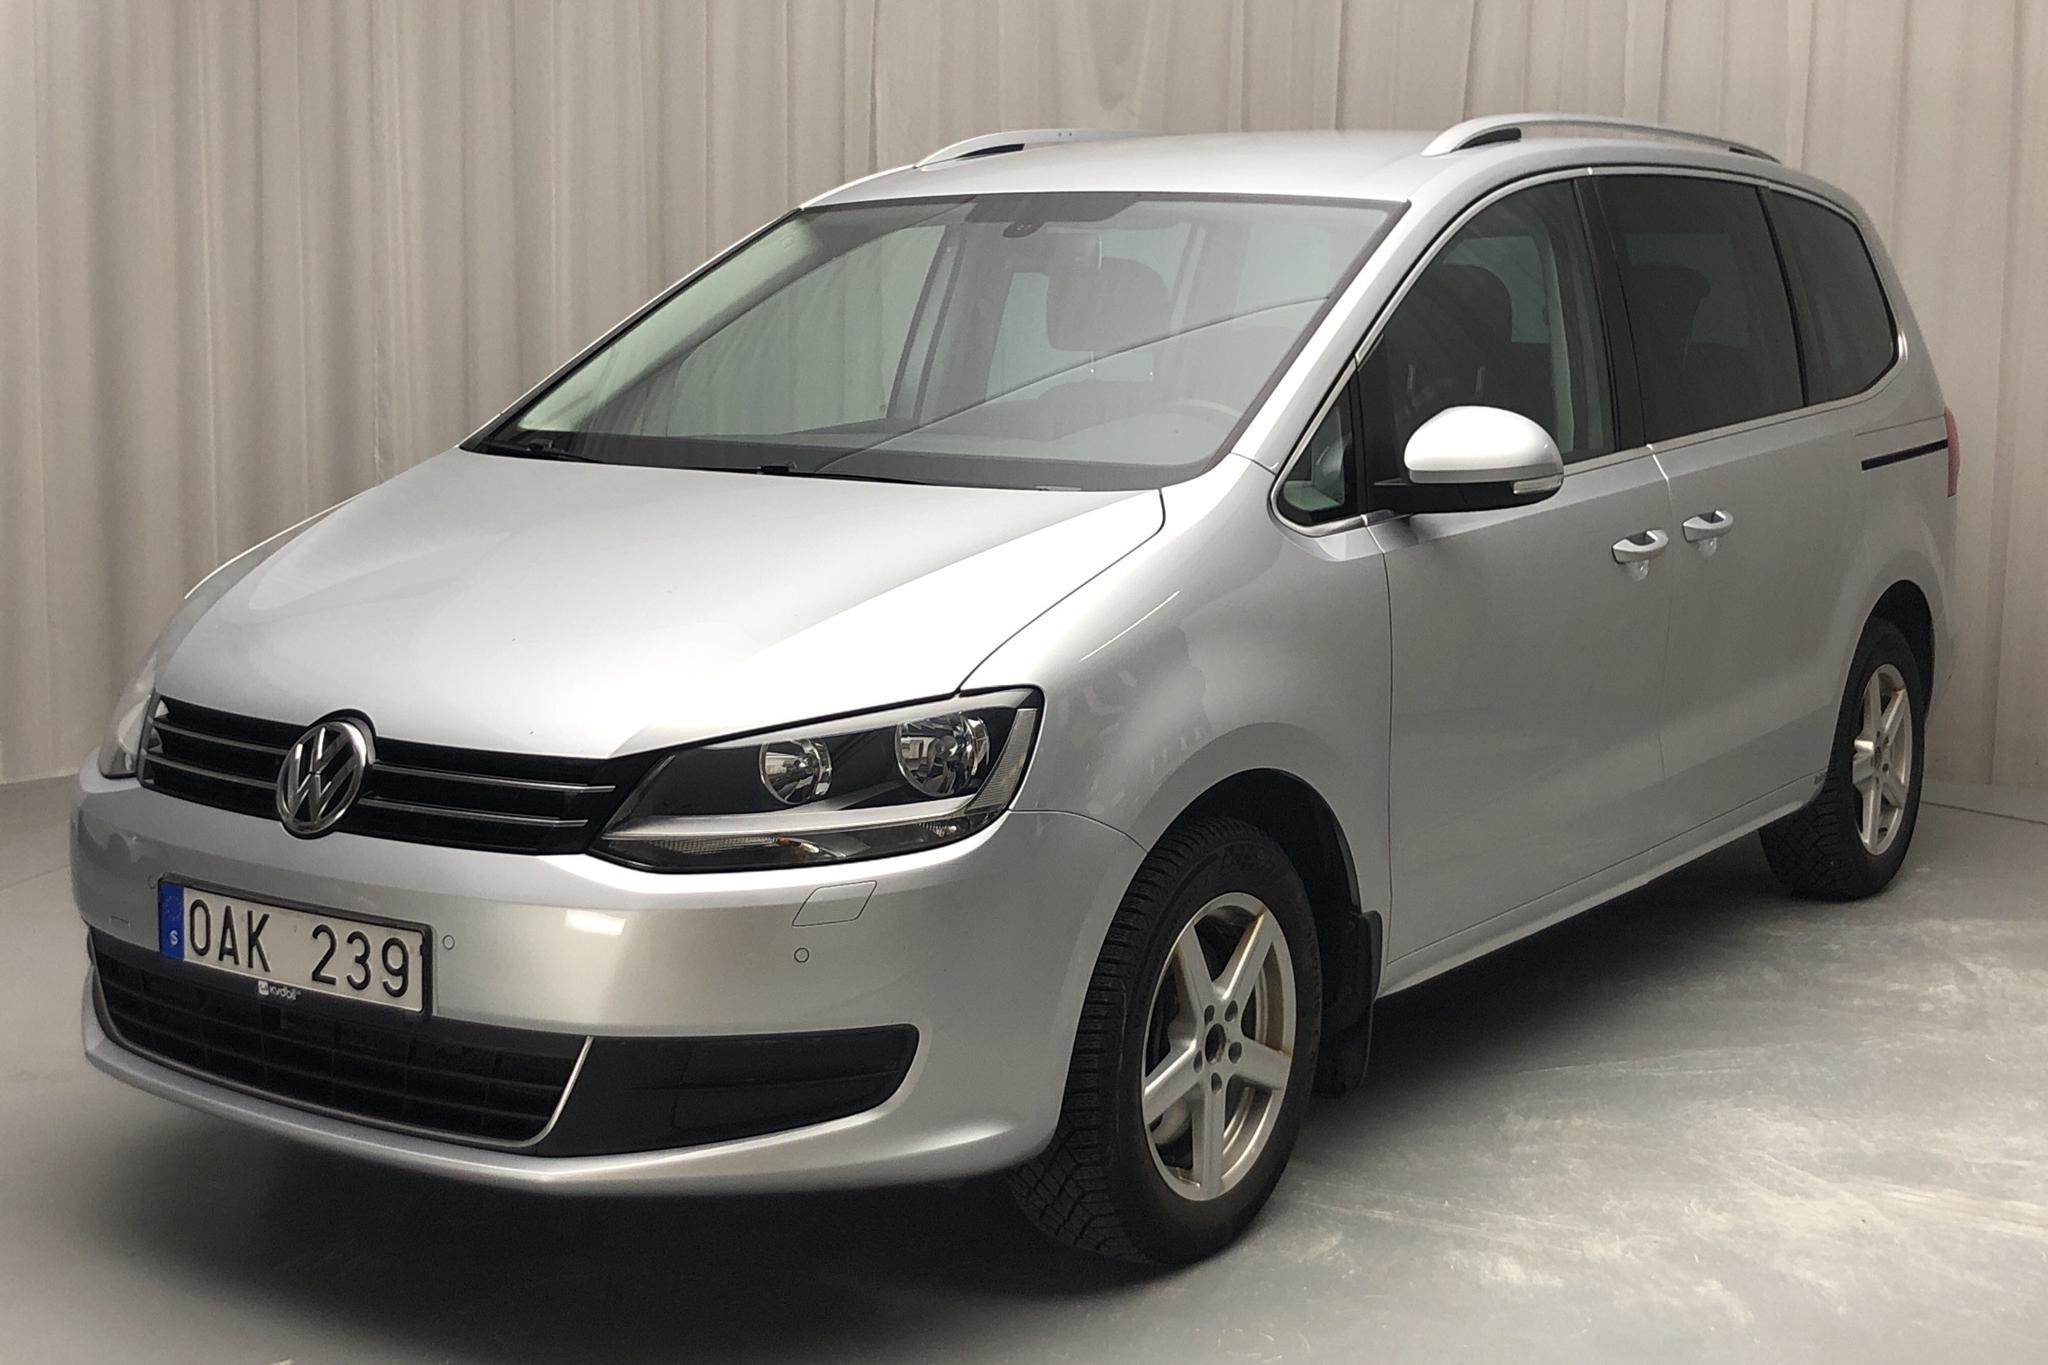 VW Sharan 2.0 TDI BlueMotion Technology 4motion (140hk) - 120 300 km - Manual - silver - 2014